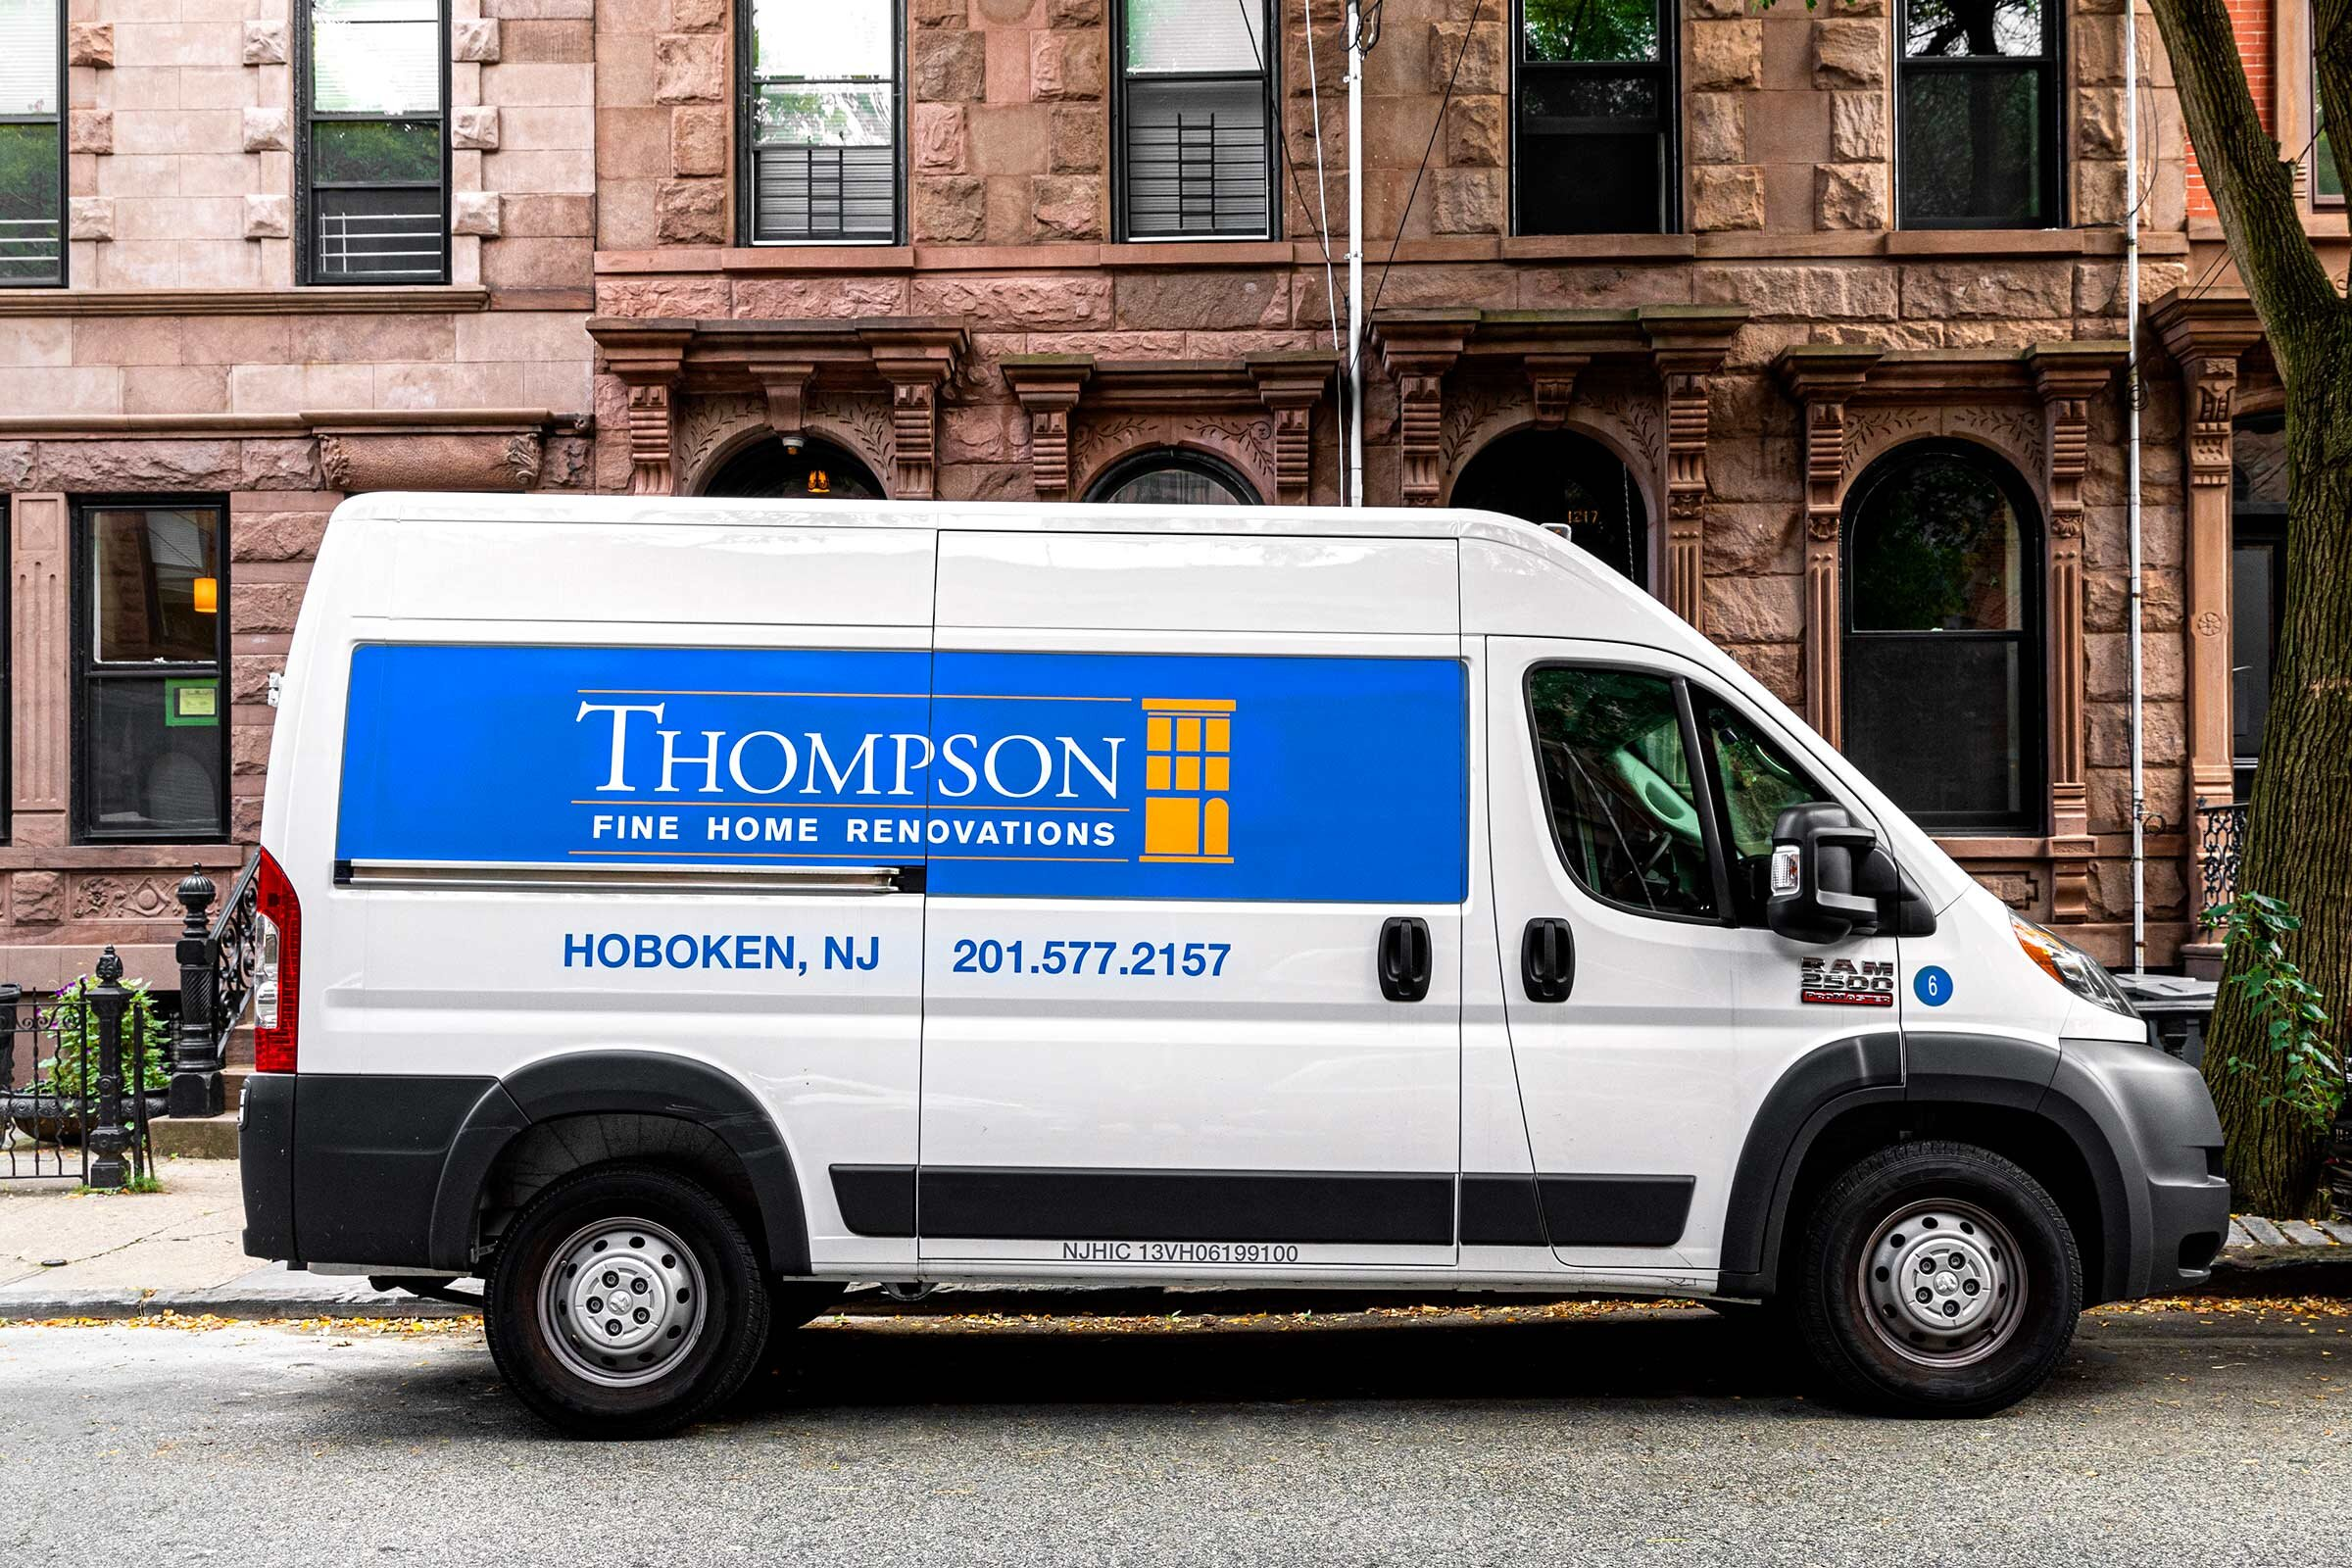 thompson-home-renovations-contractor-hoboken-brownstone-street.jpg